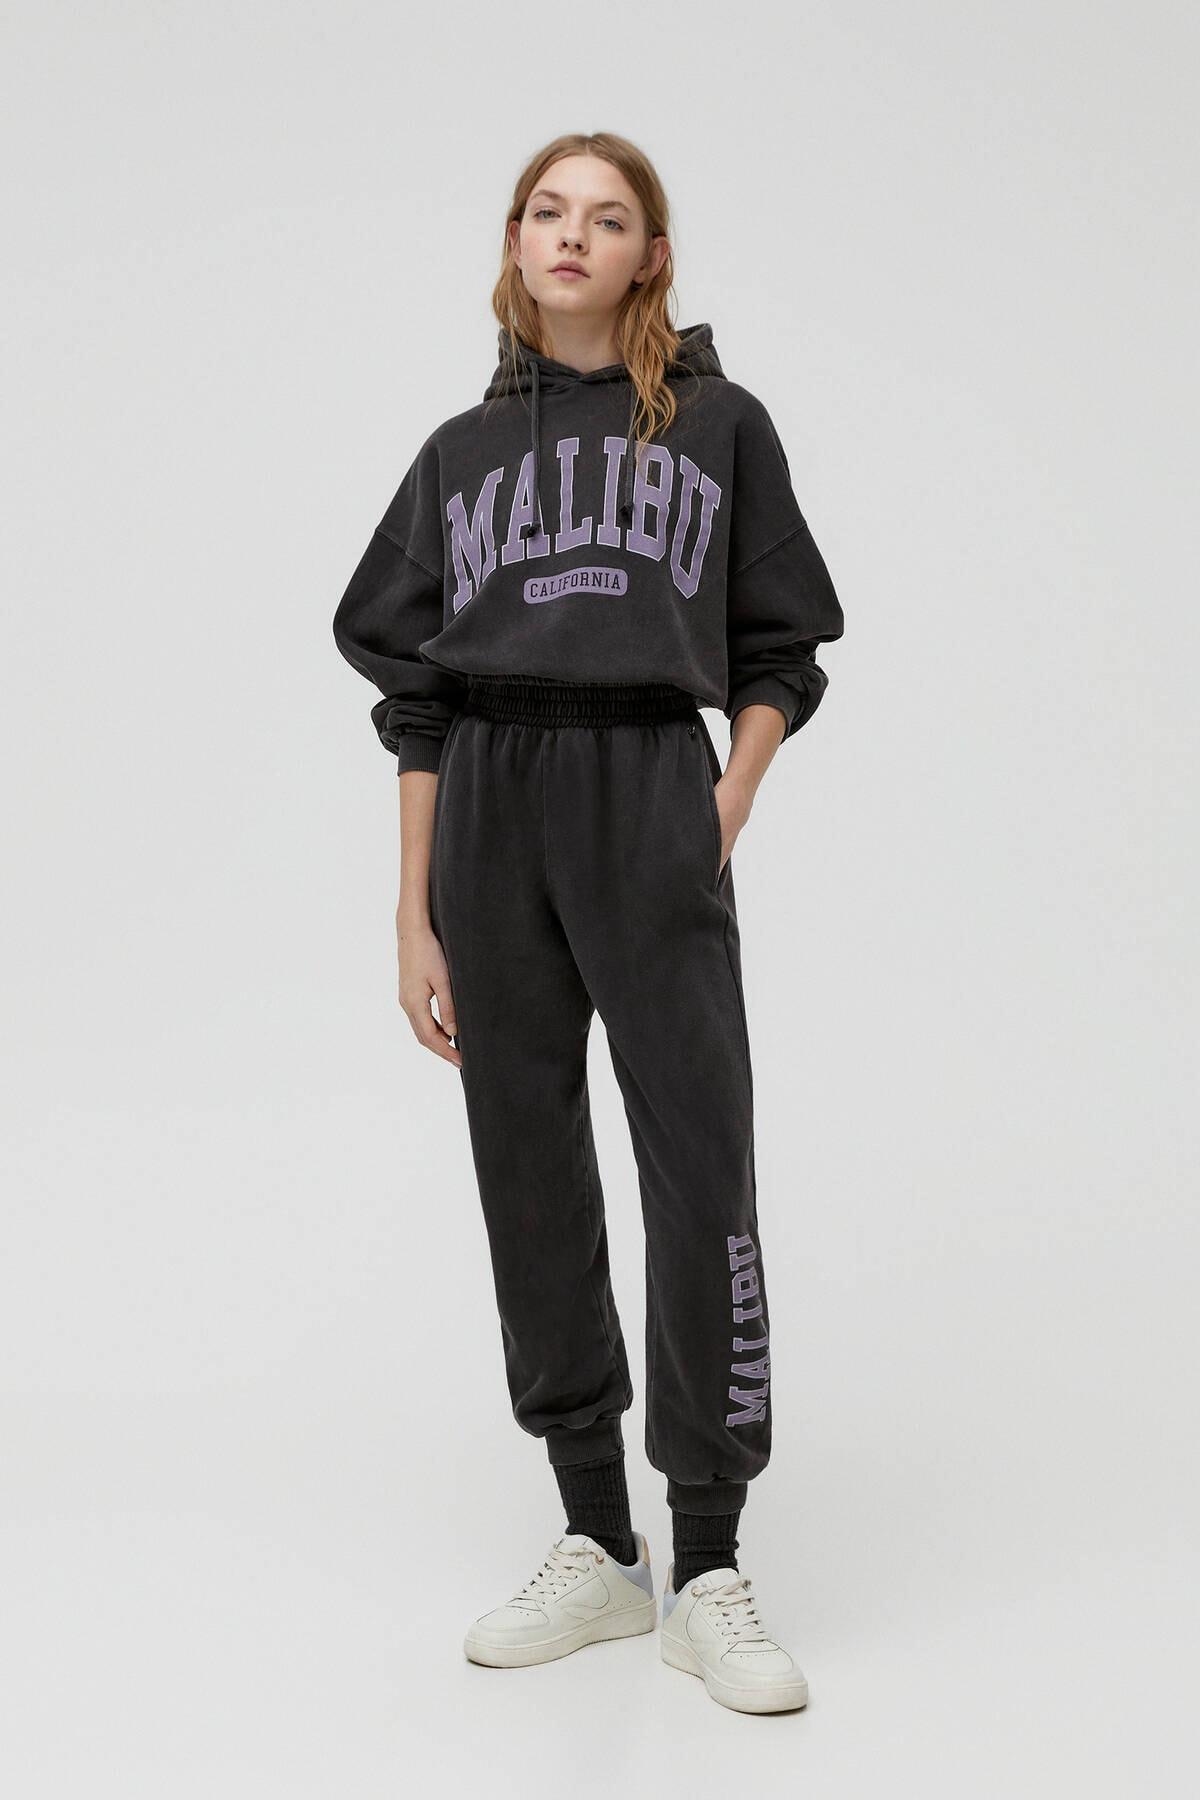 Pull & Bear Kadın Soluk Siyah Miami Sloganlı Jogging Fit Pantolon 04677303 0